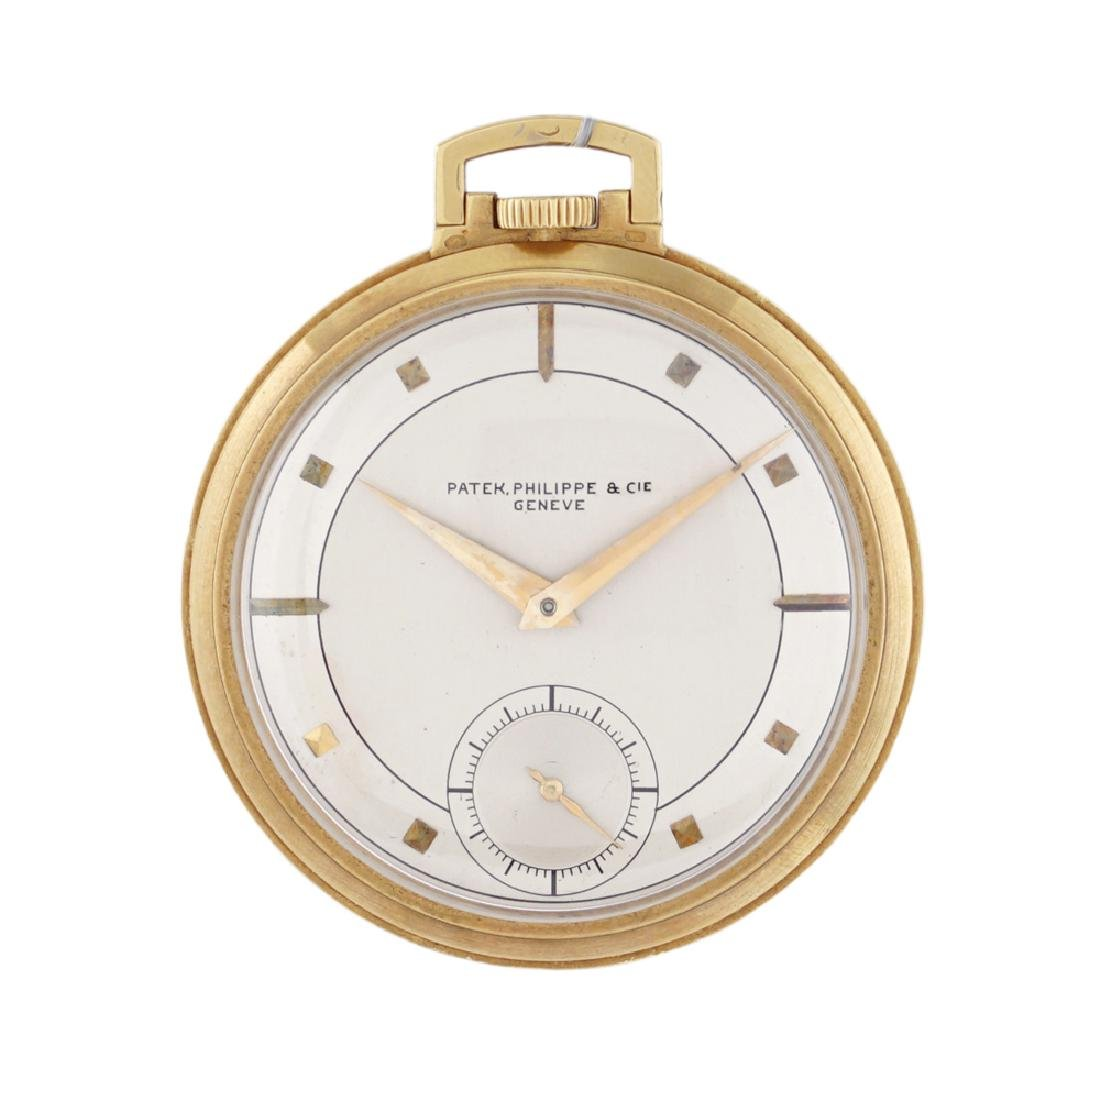 Patek Philippe & Cie, pocket watch '60ies circa peso 54